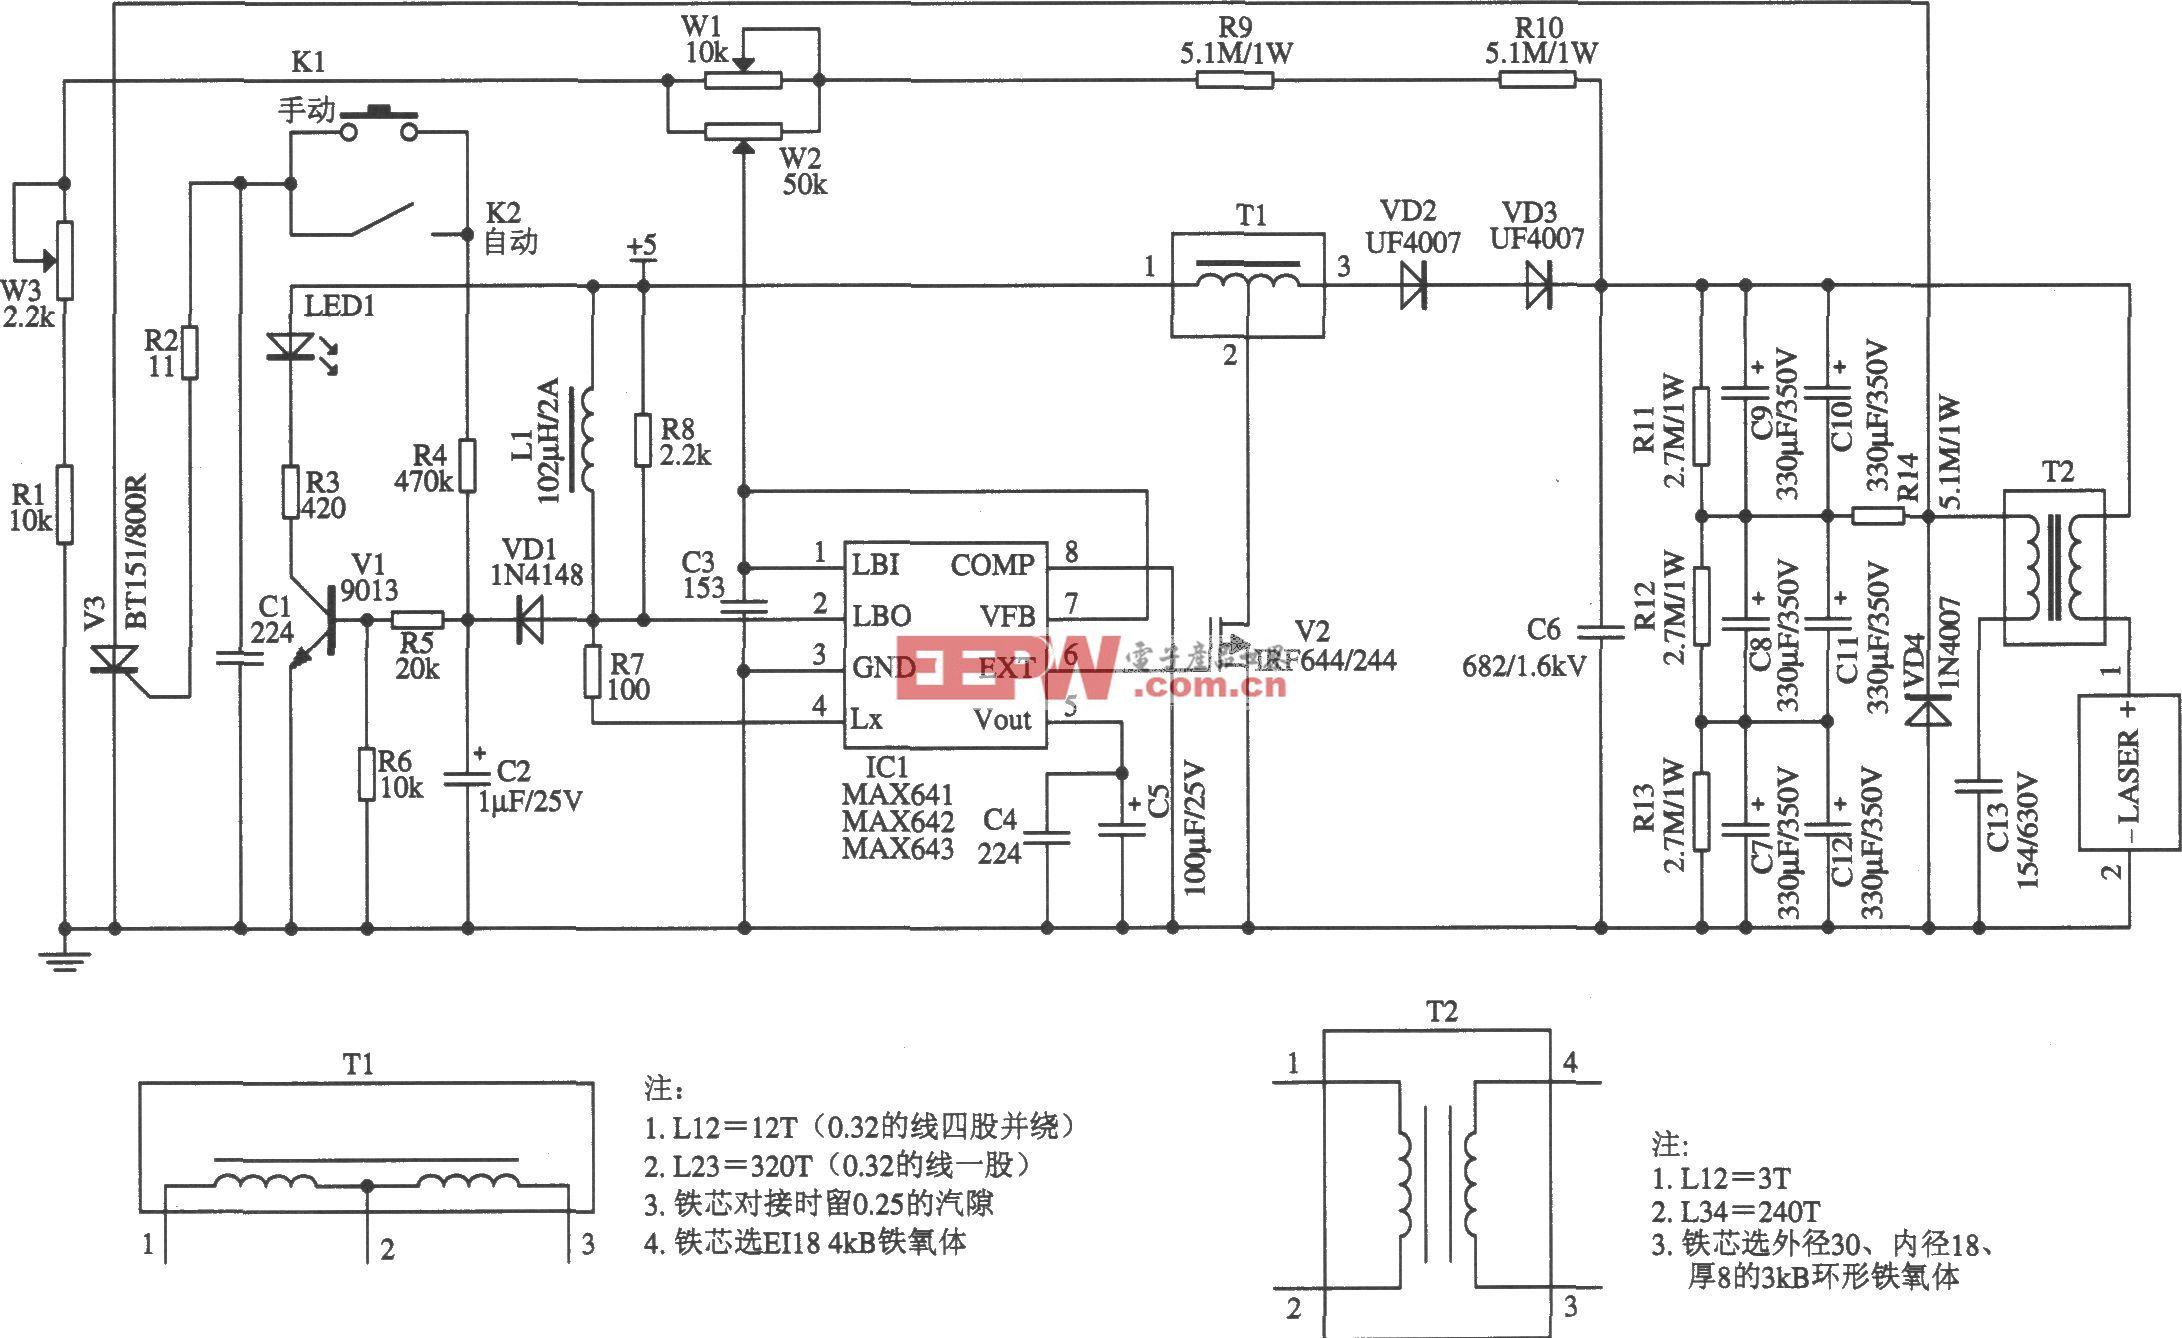 MAX641/MAX642构成脉冲激光电源的升压型应用电路